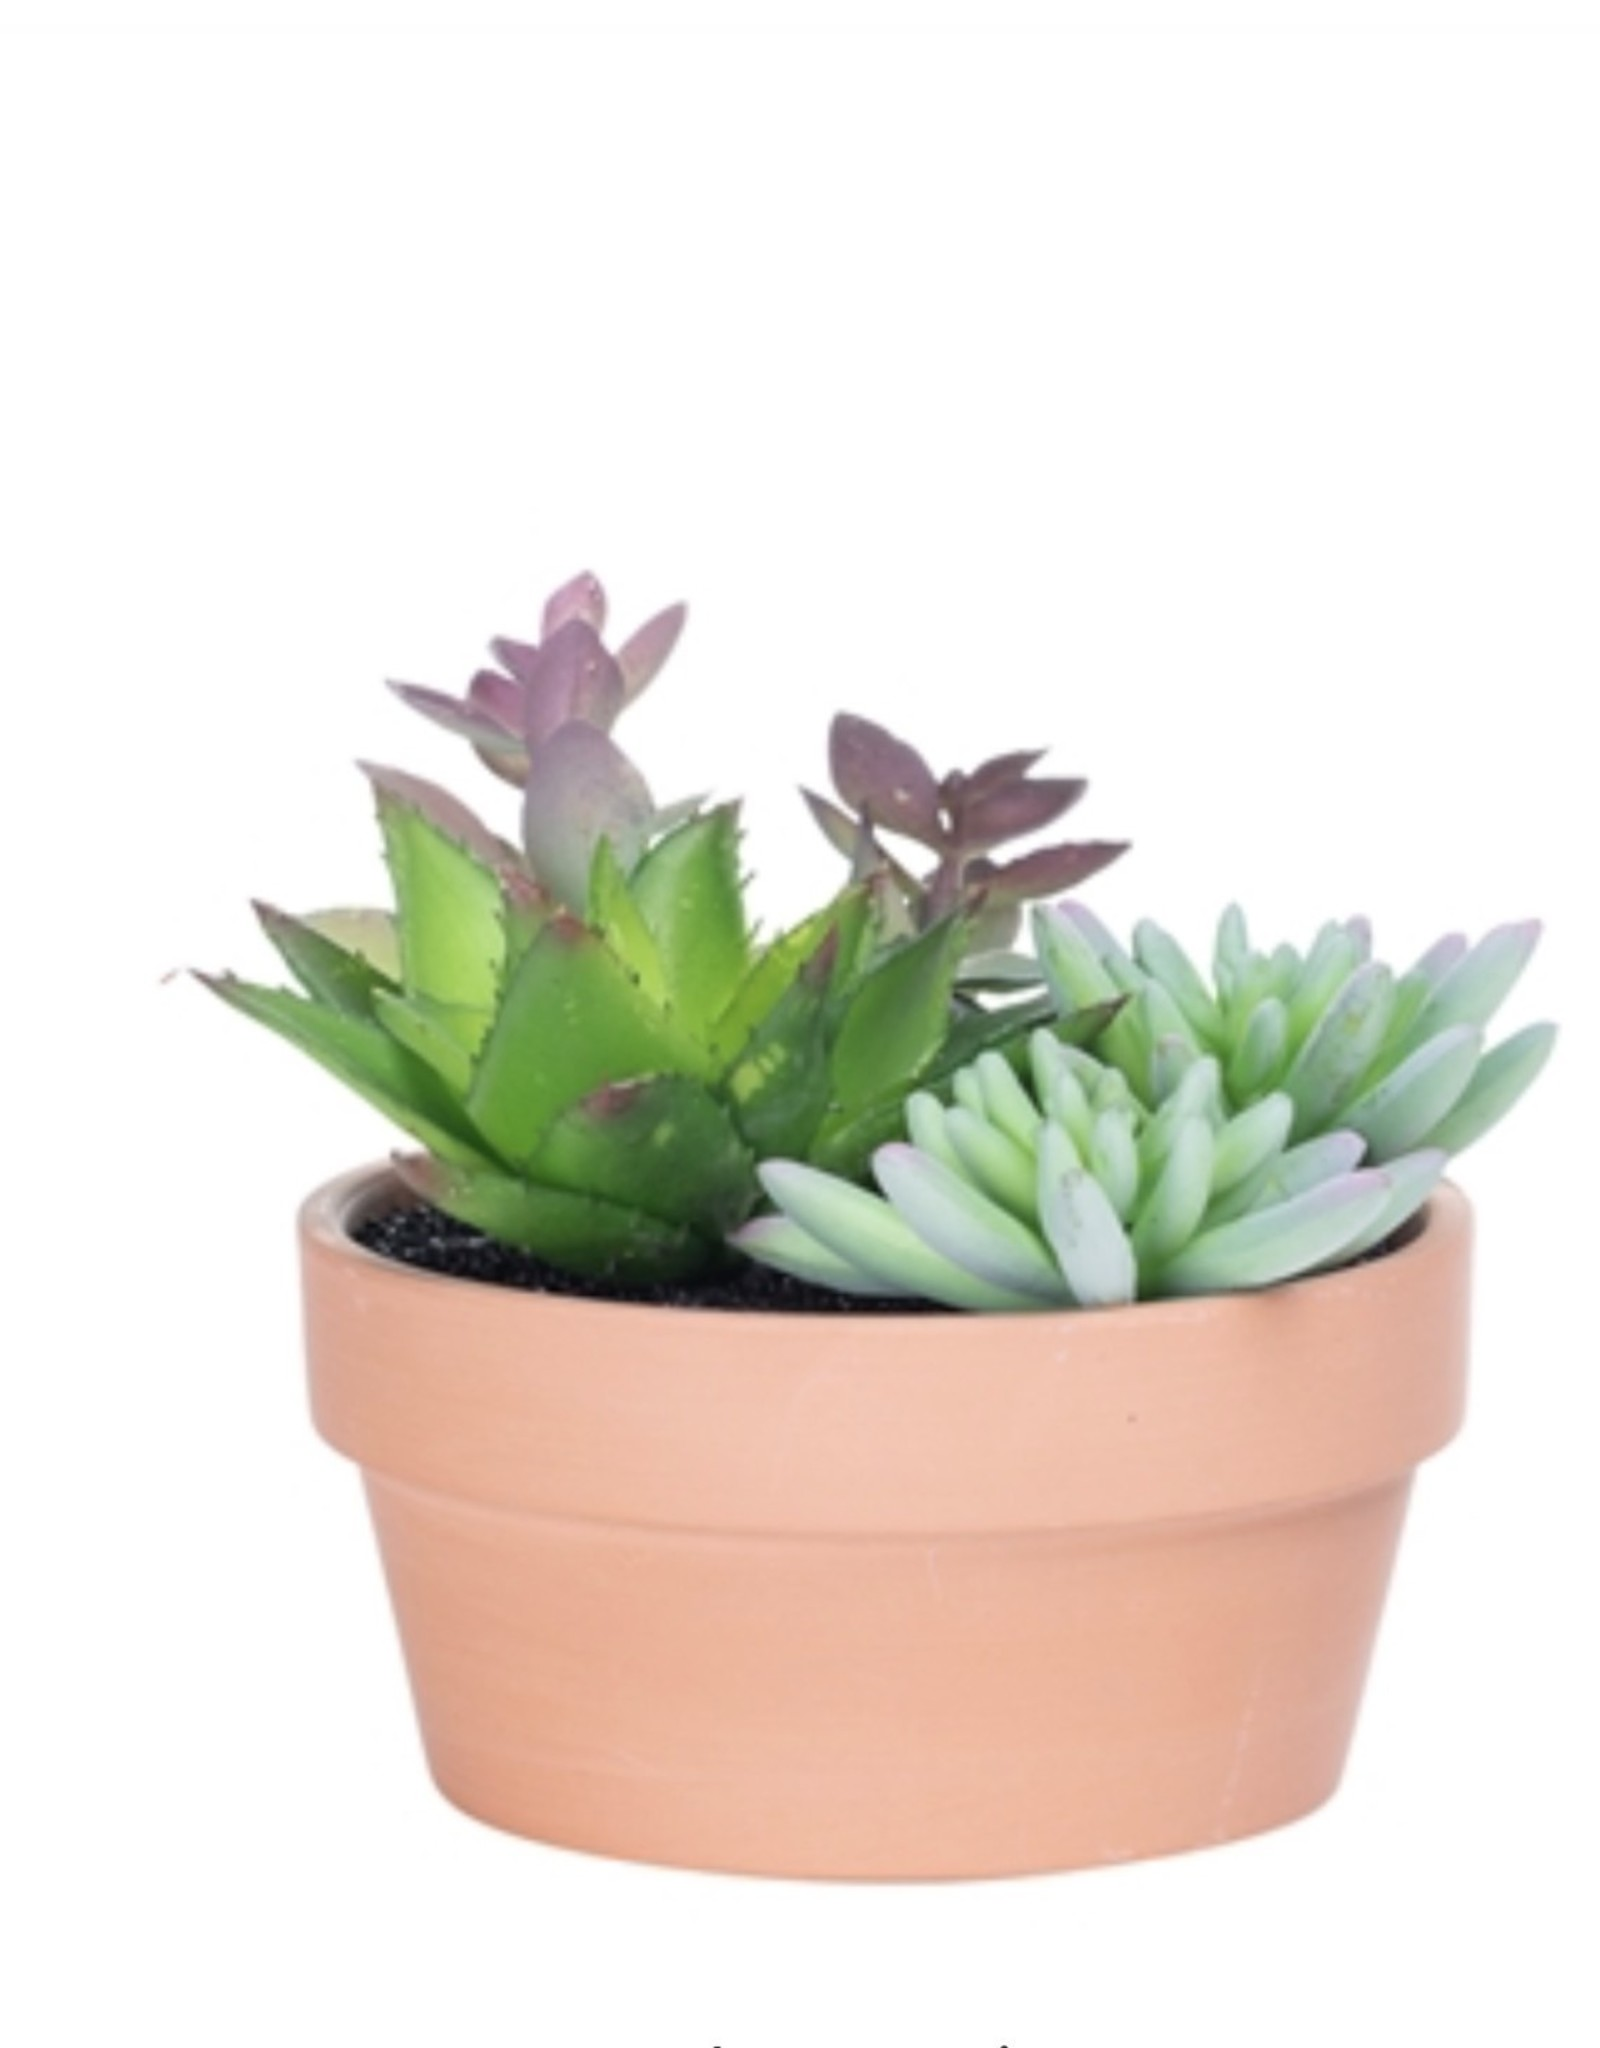 Plant Potted Succulent 5.5'' DIA Terracotta